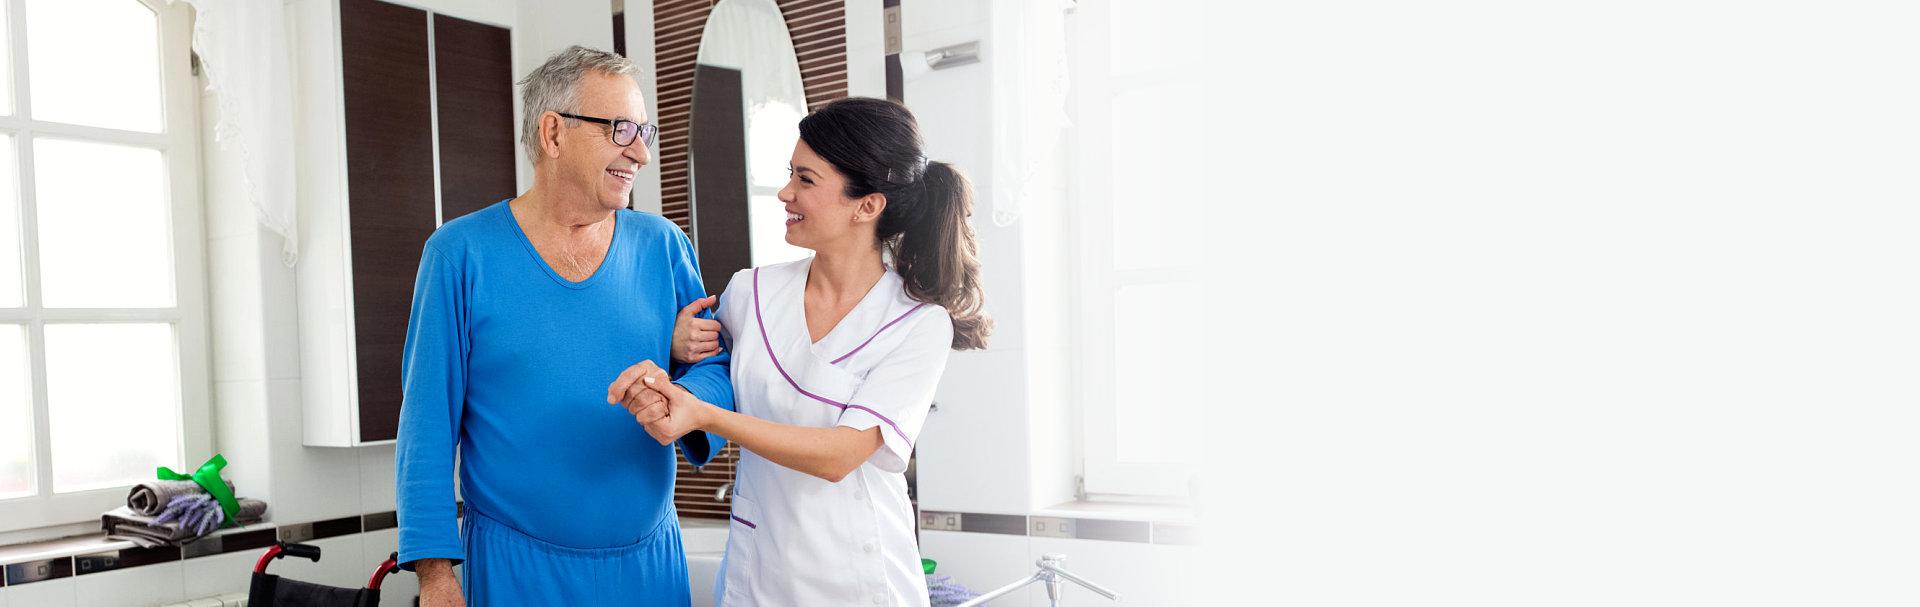 Young beautiful nurse helps senior man at the bathroom